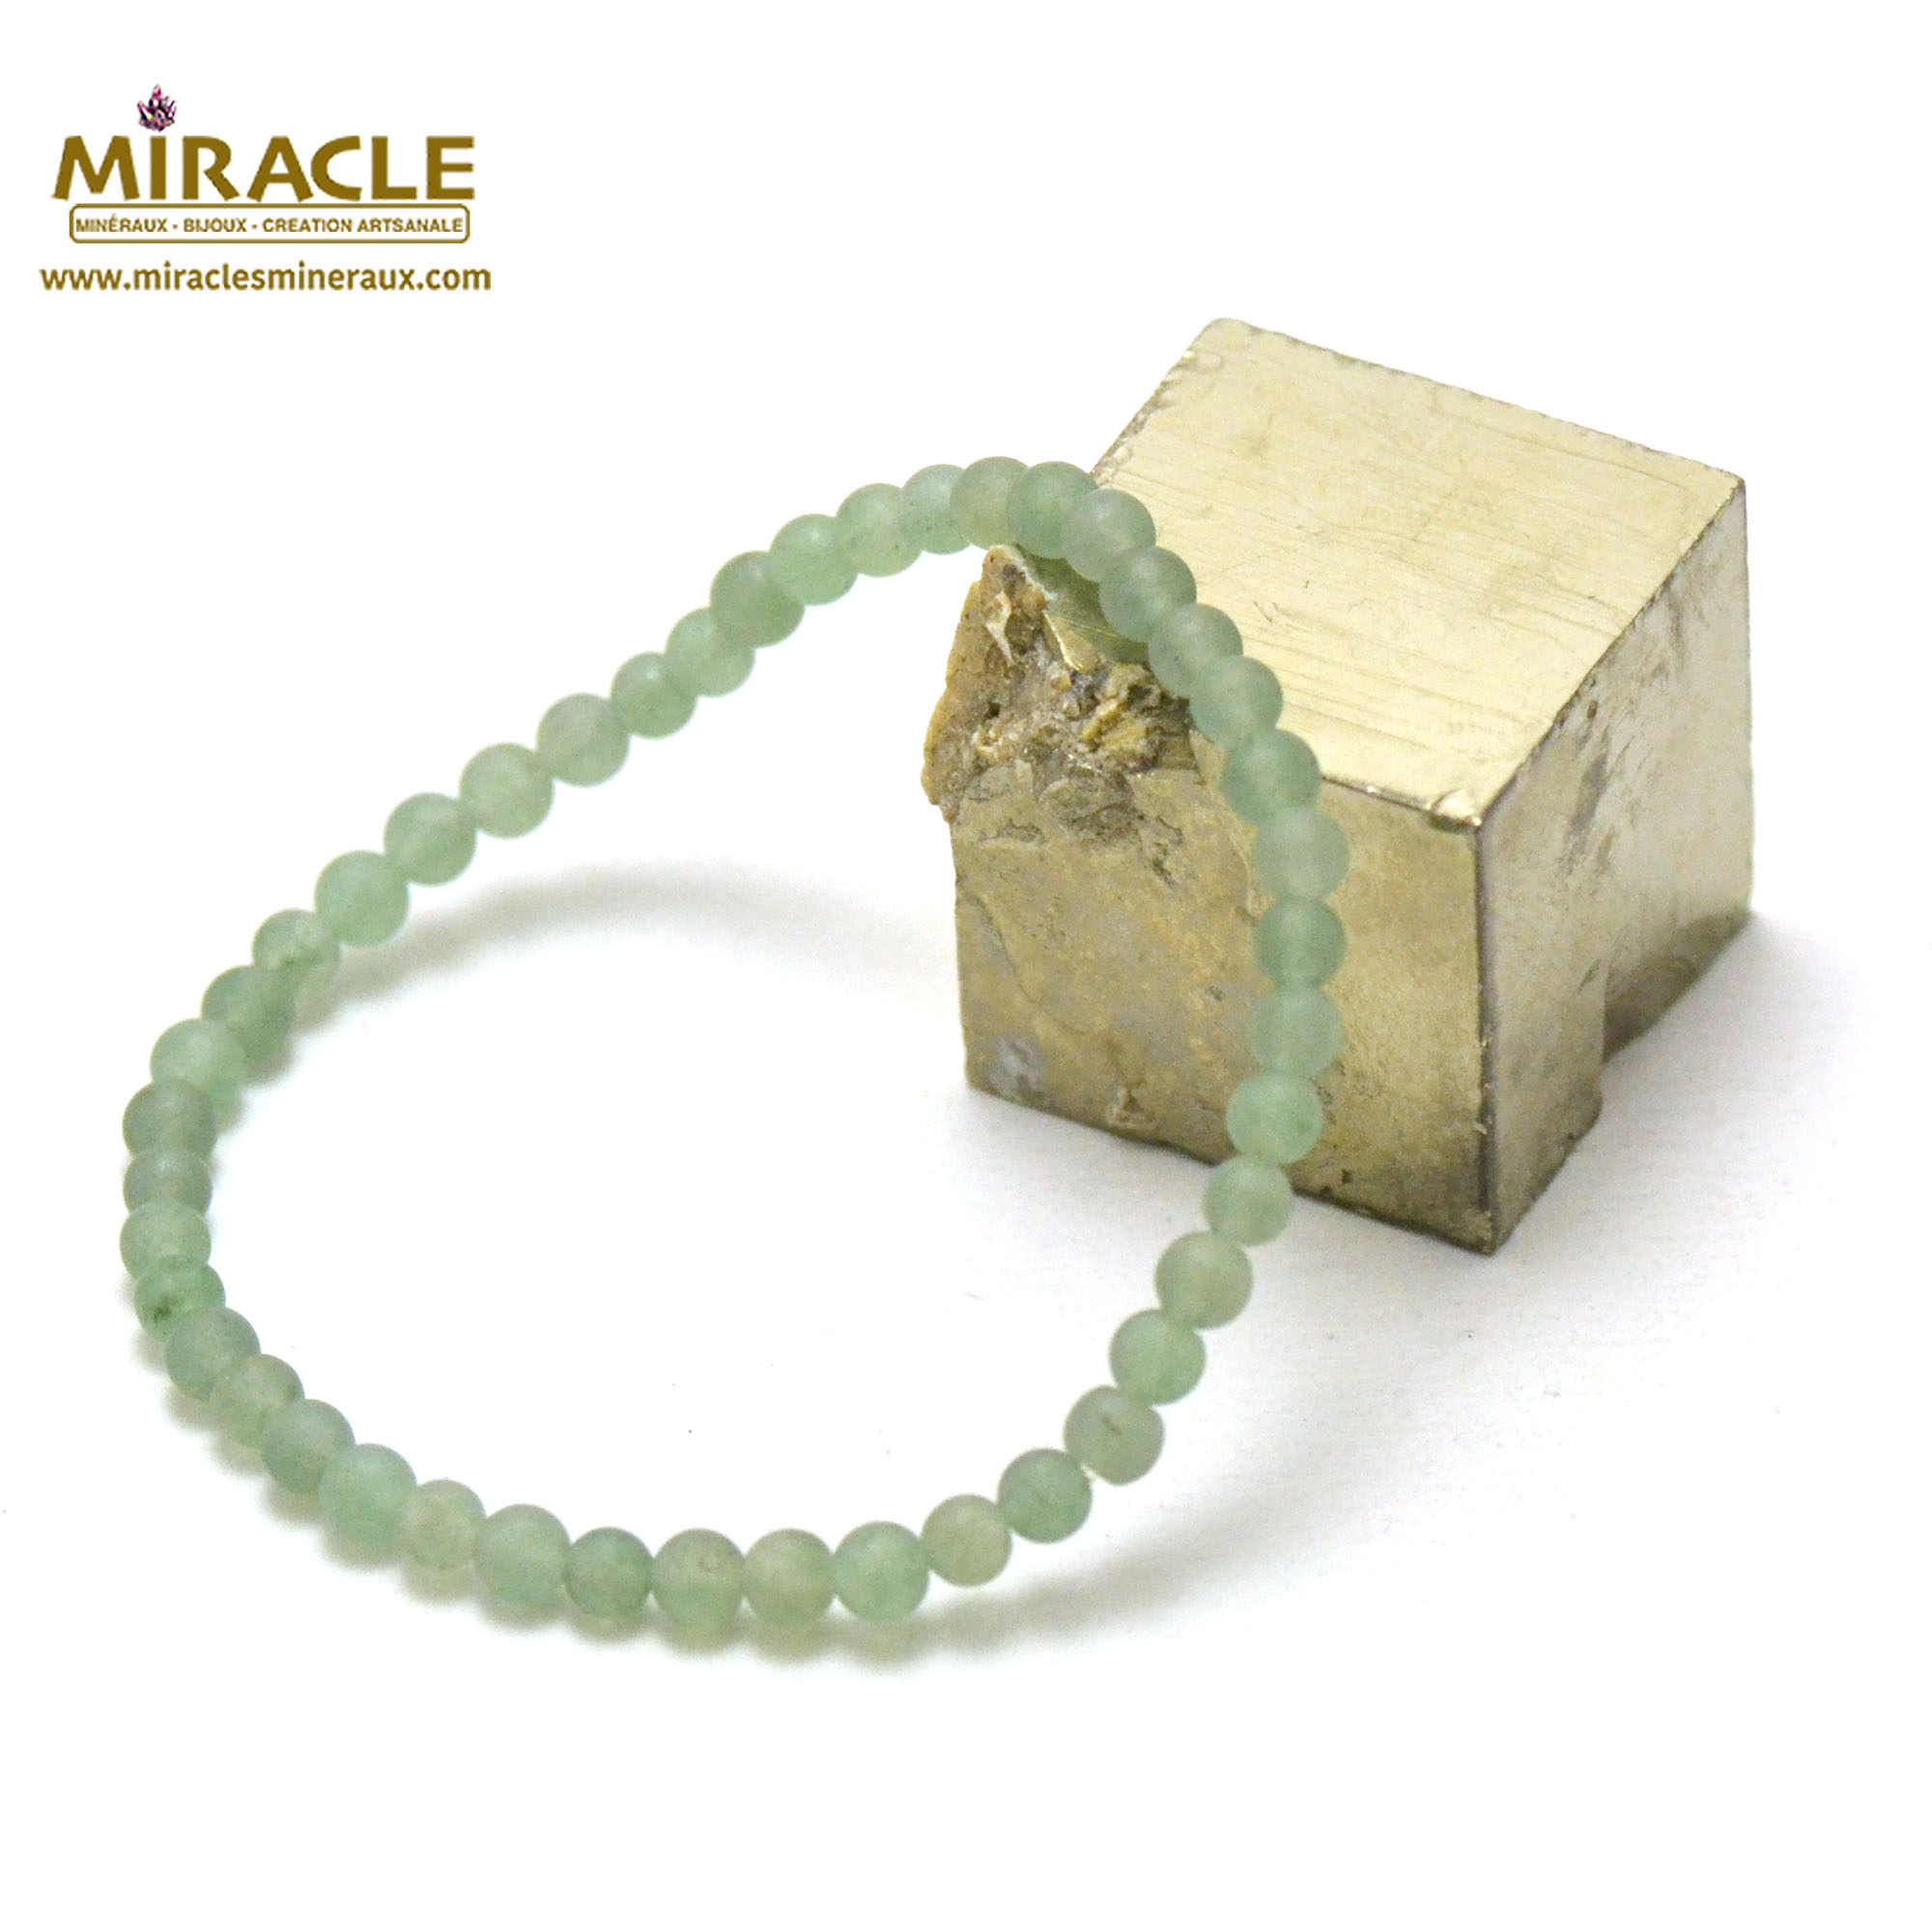 bracelet aventurine givré  perle mat ronde 4 mm